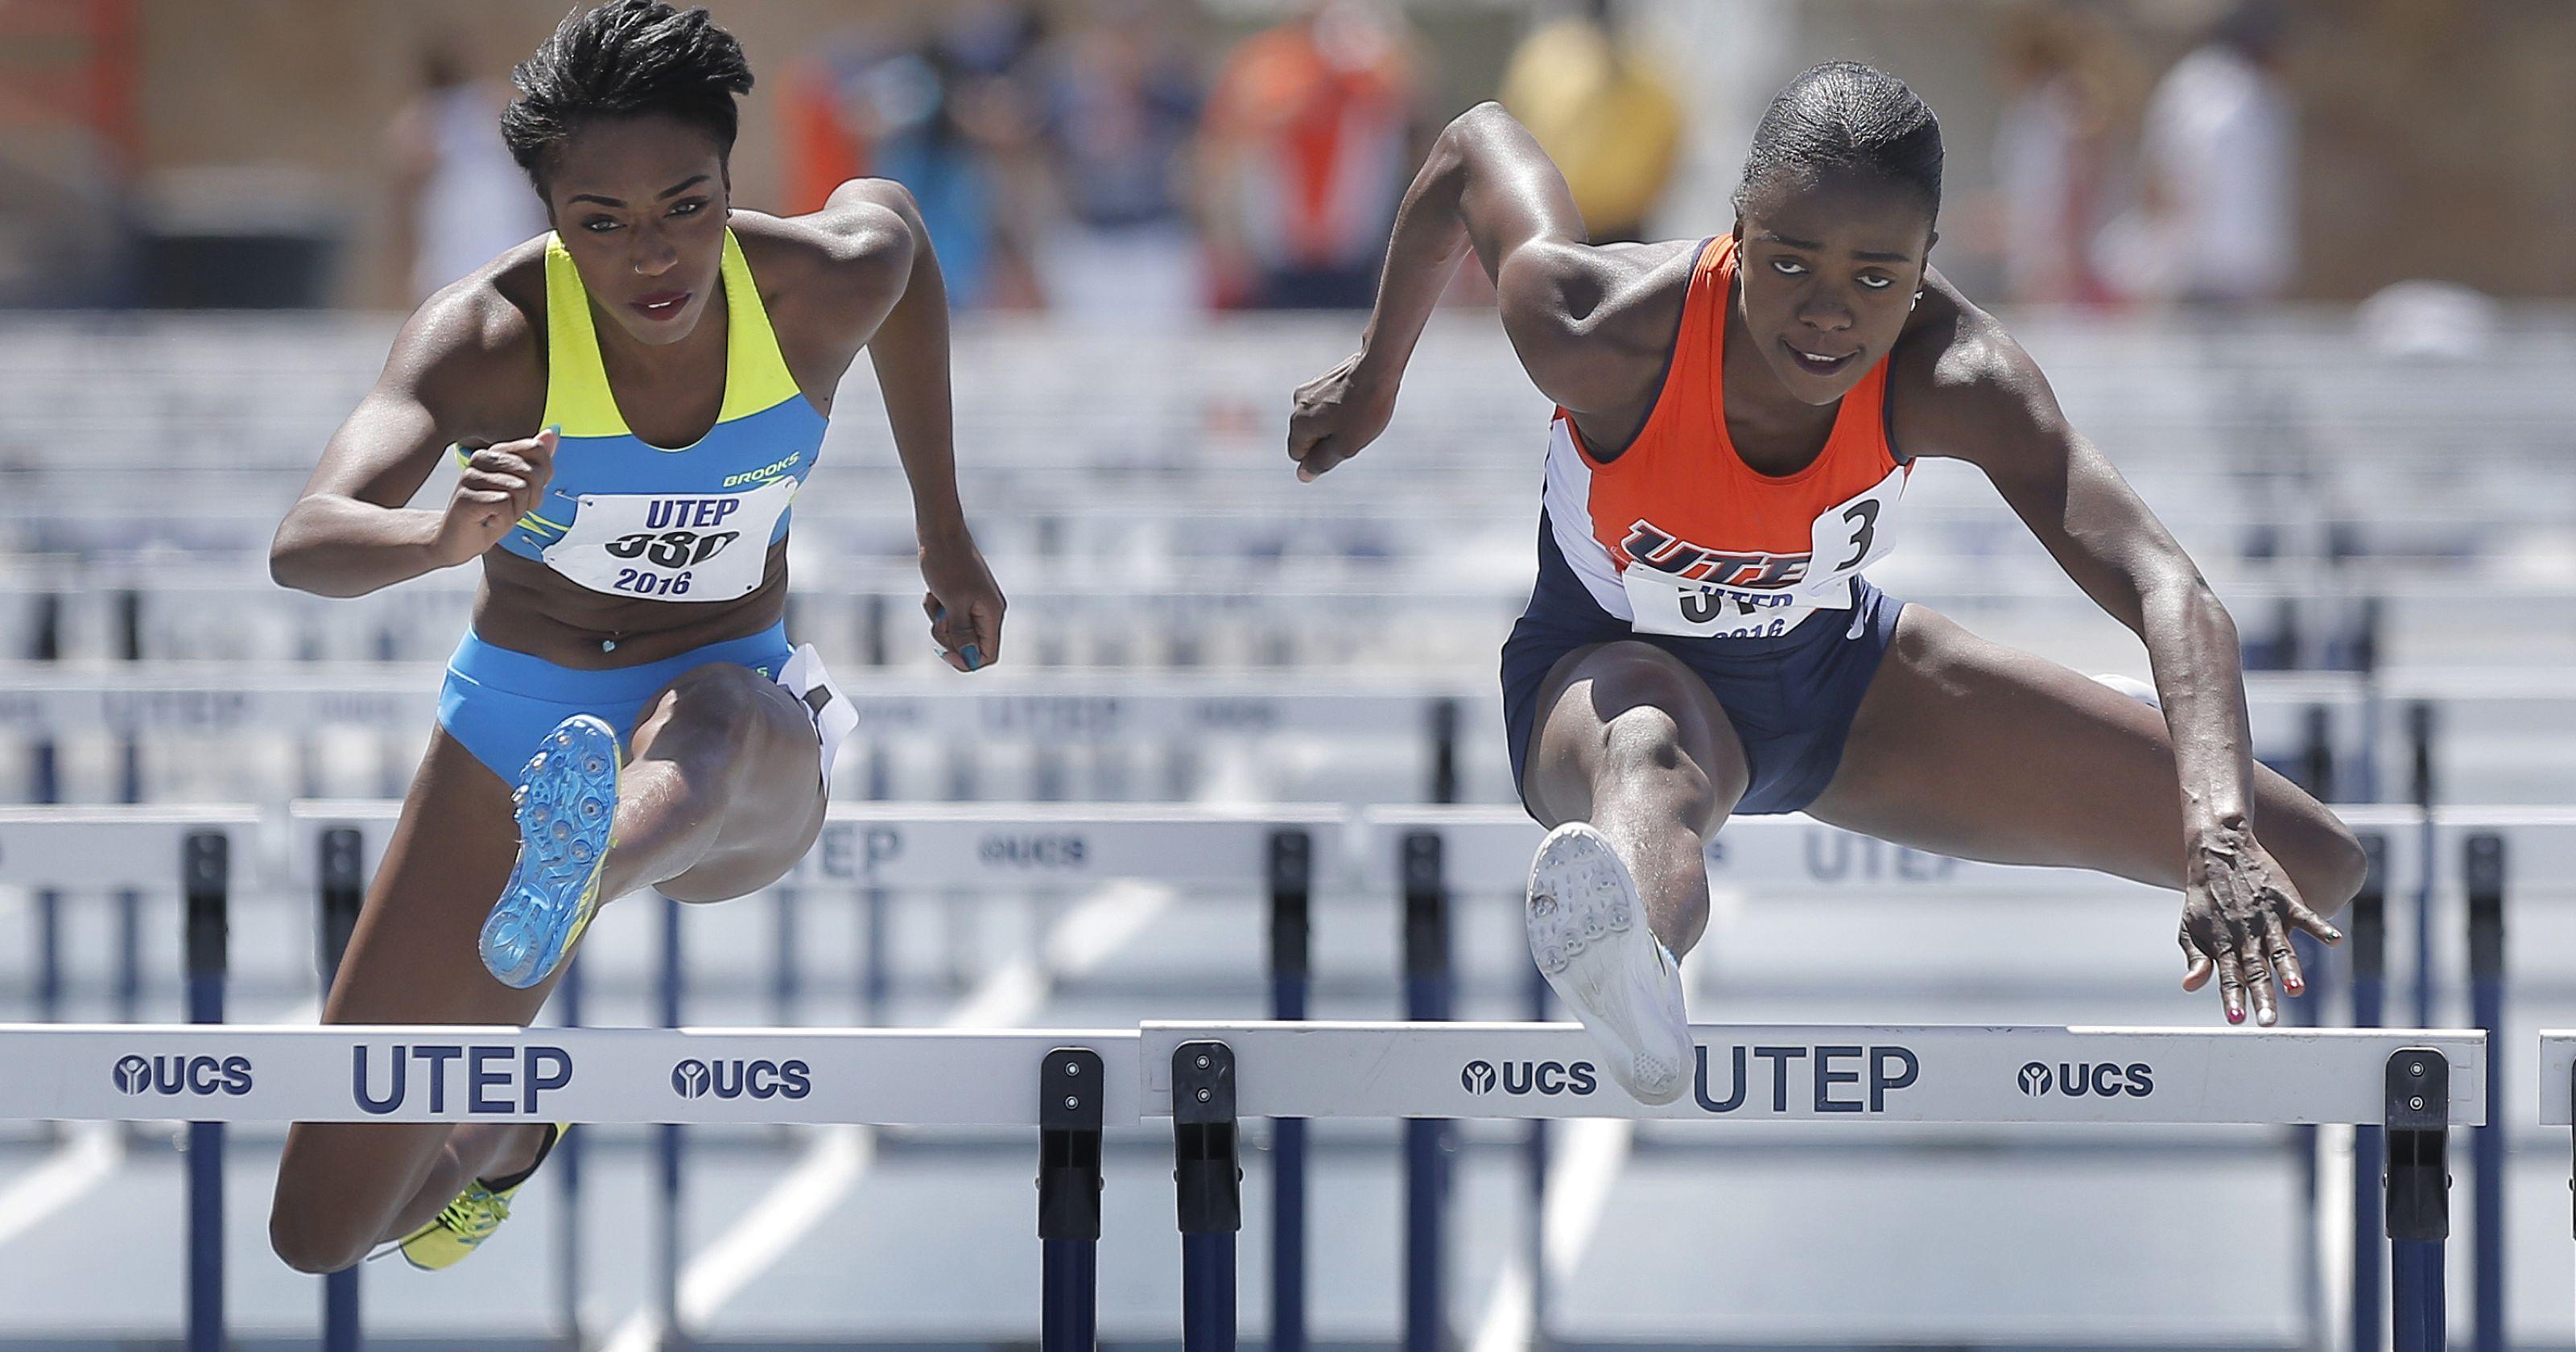 Nigeria's Amusan Claims American NCAA 100m Hurdles Crown